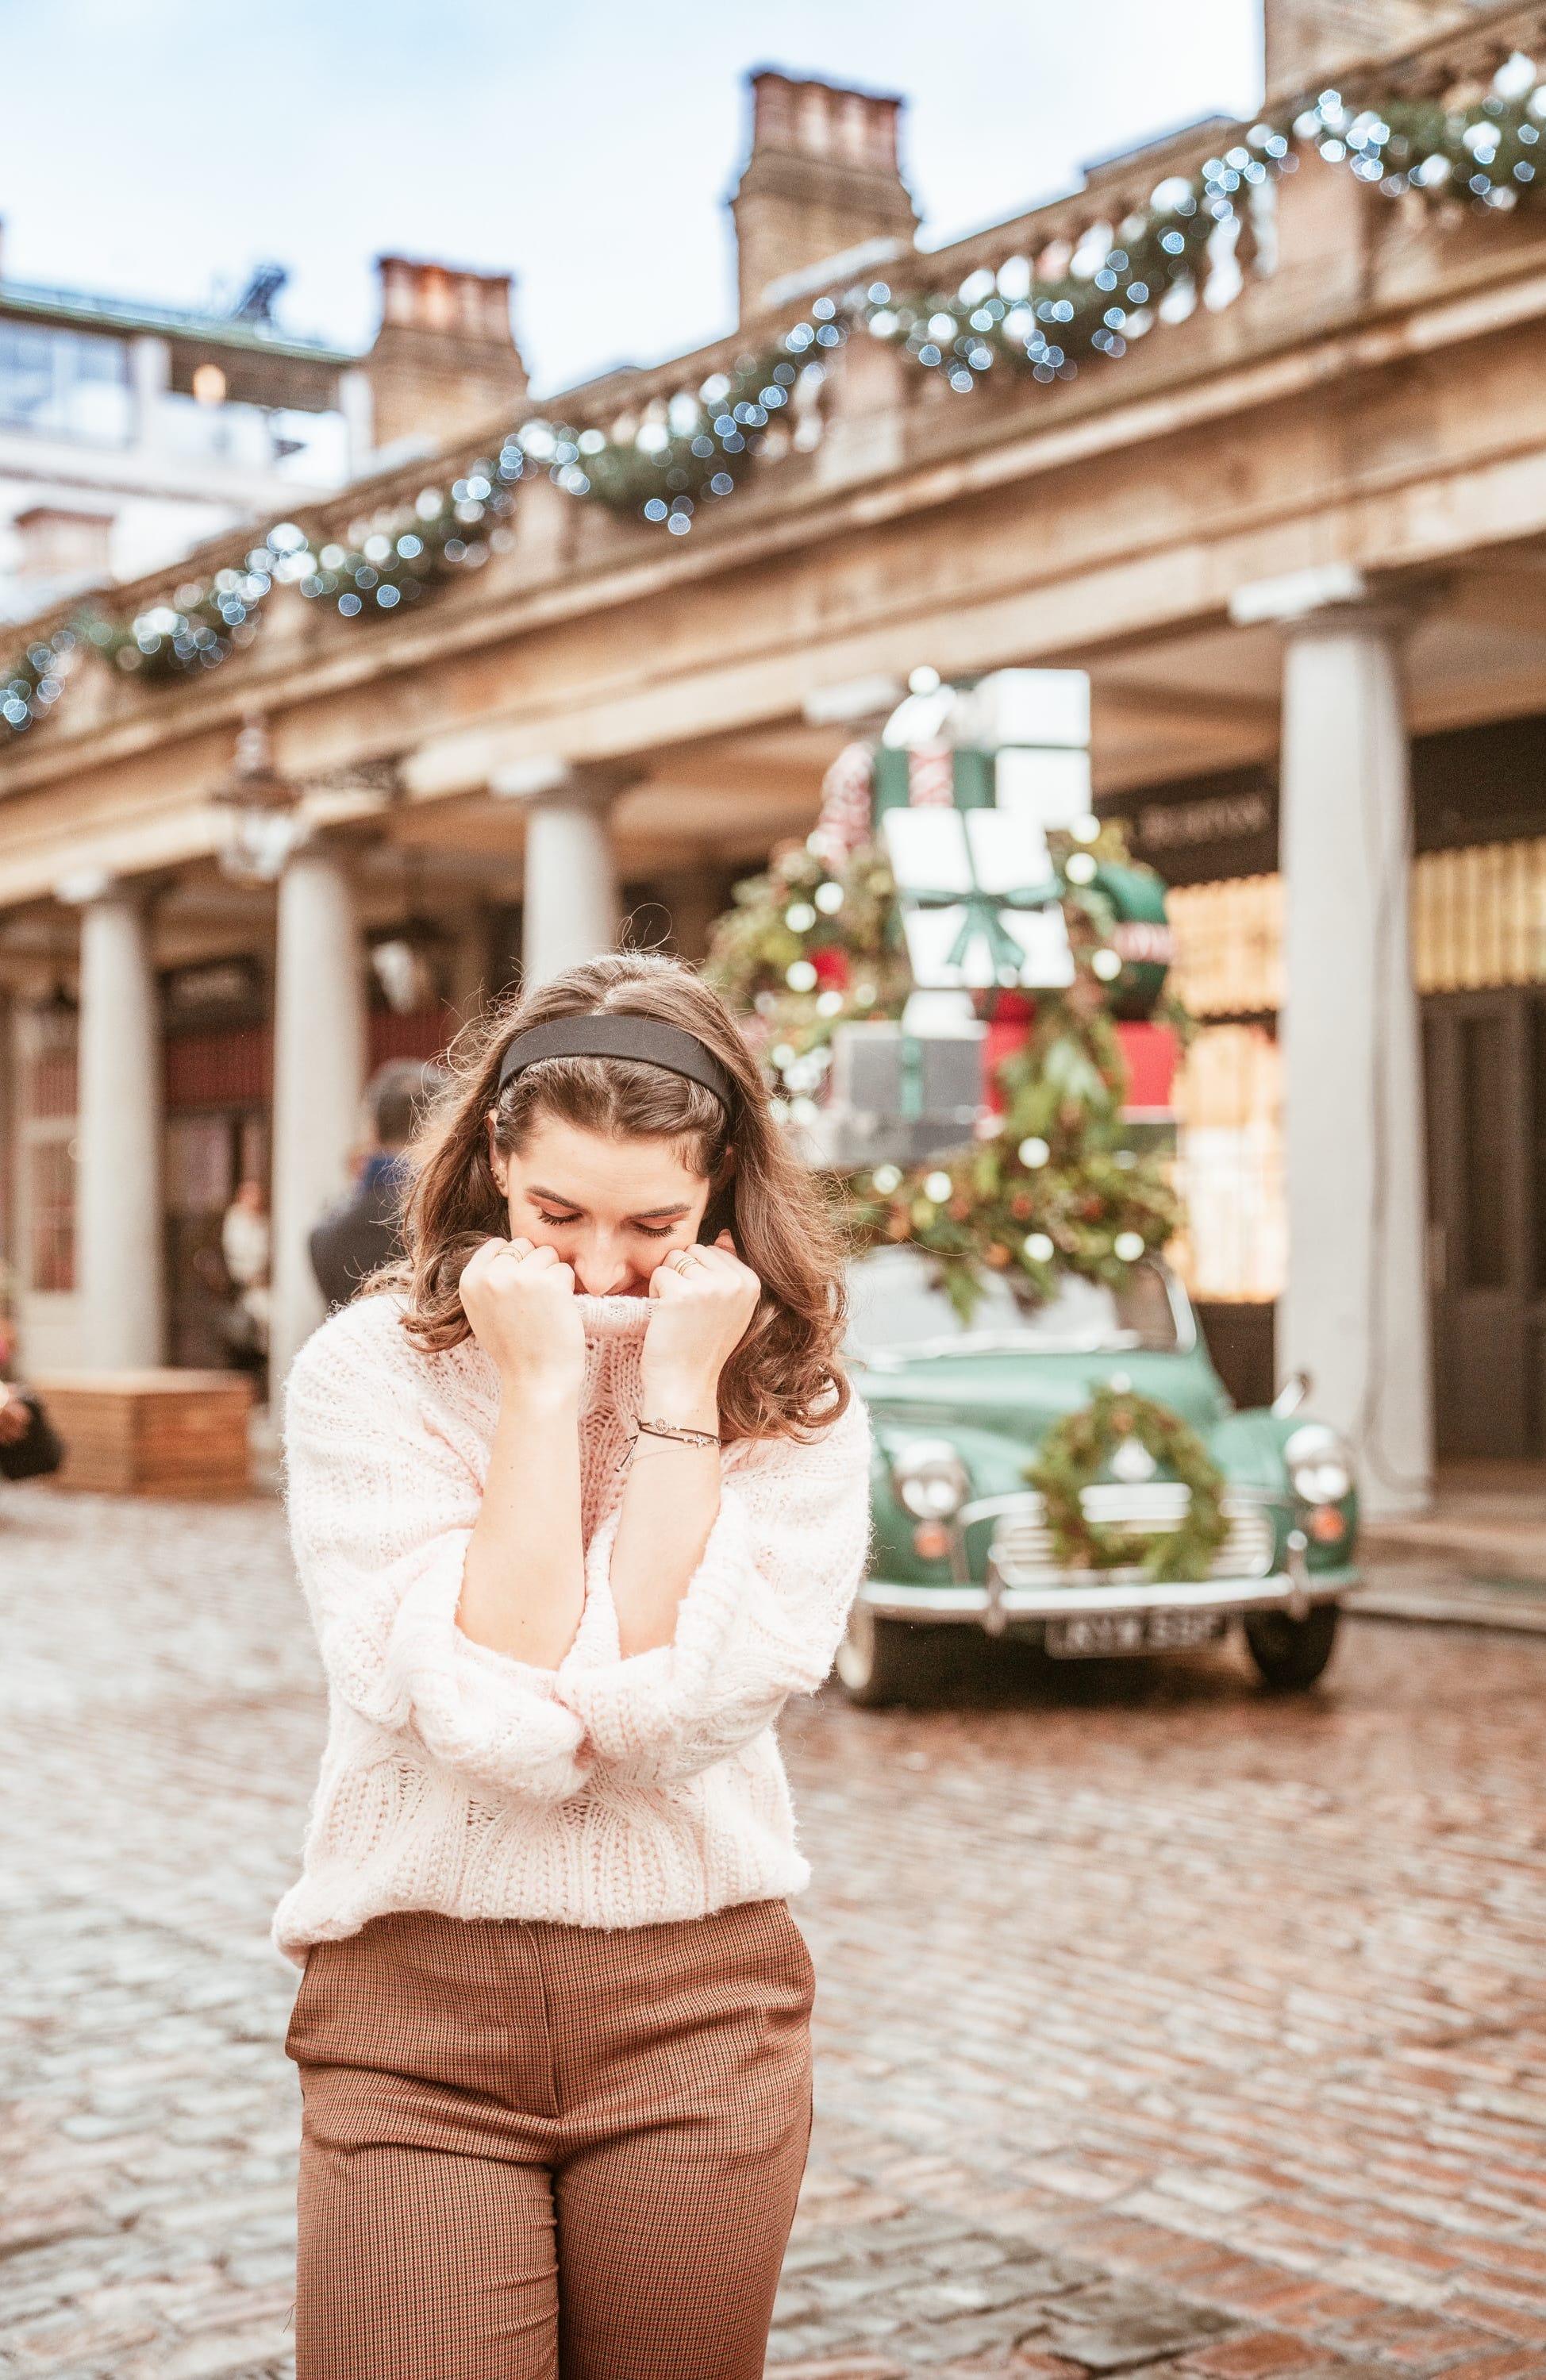 Arara Pintada shares her Guide for Christmas Season at Covent Garden